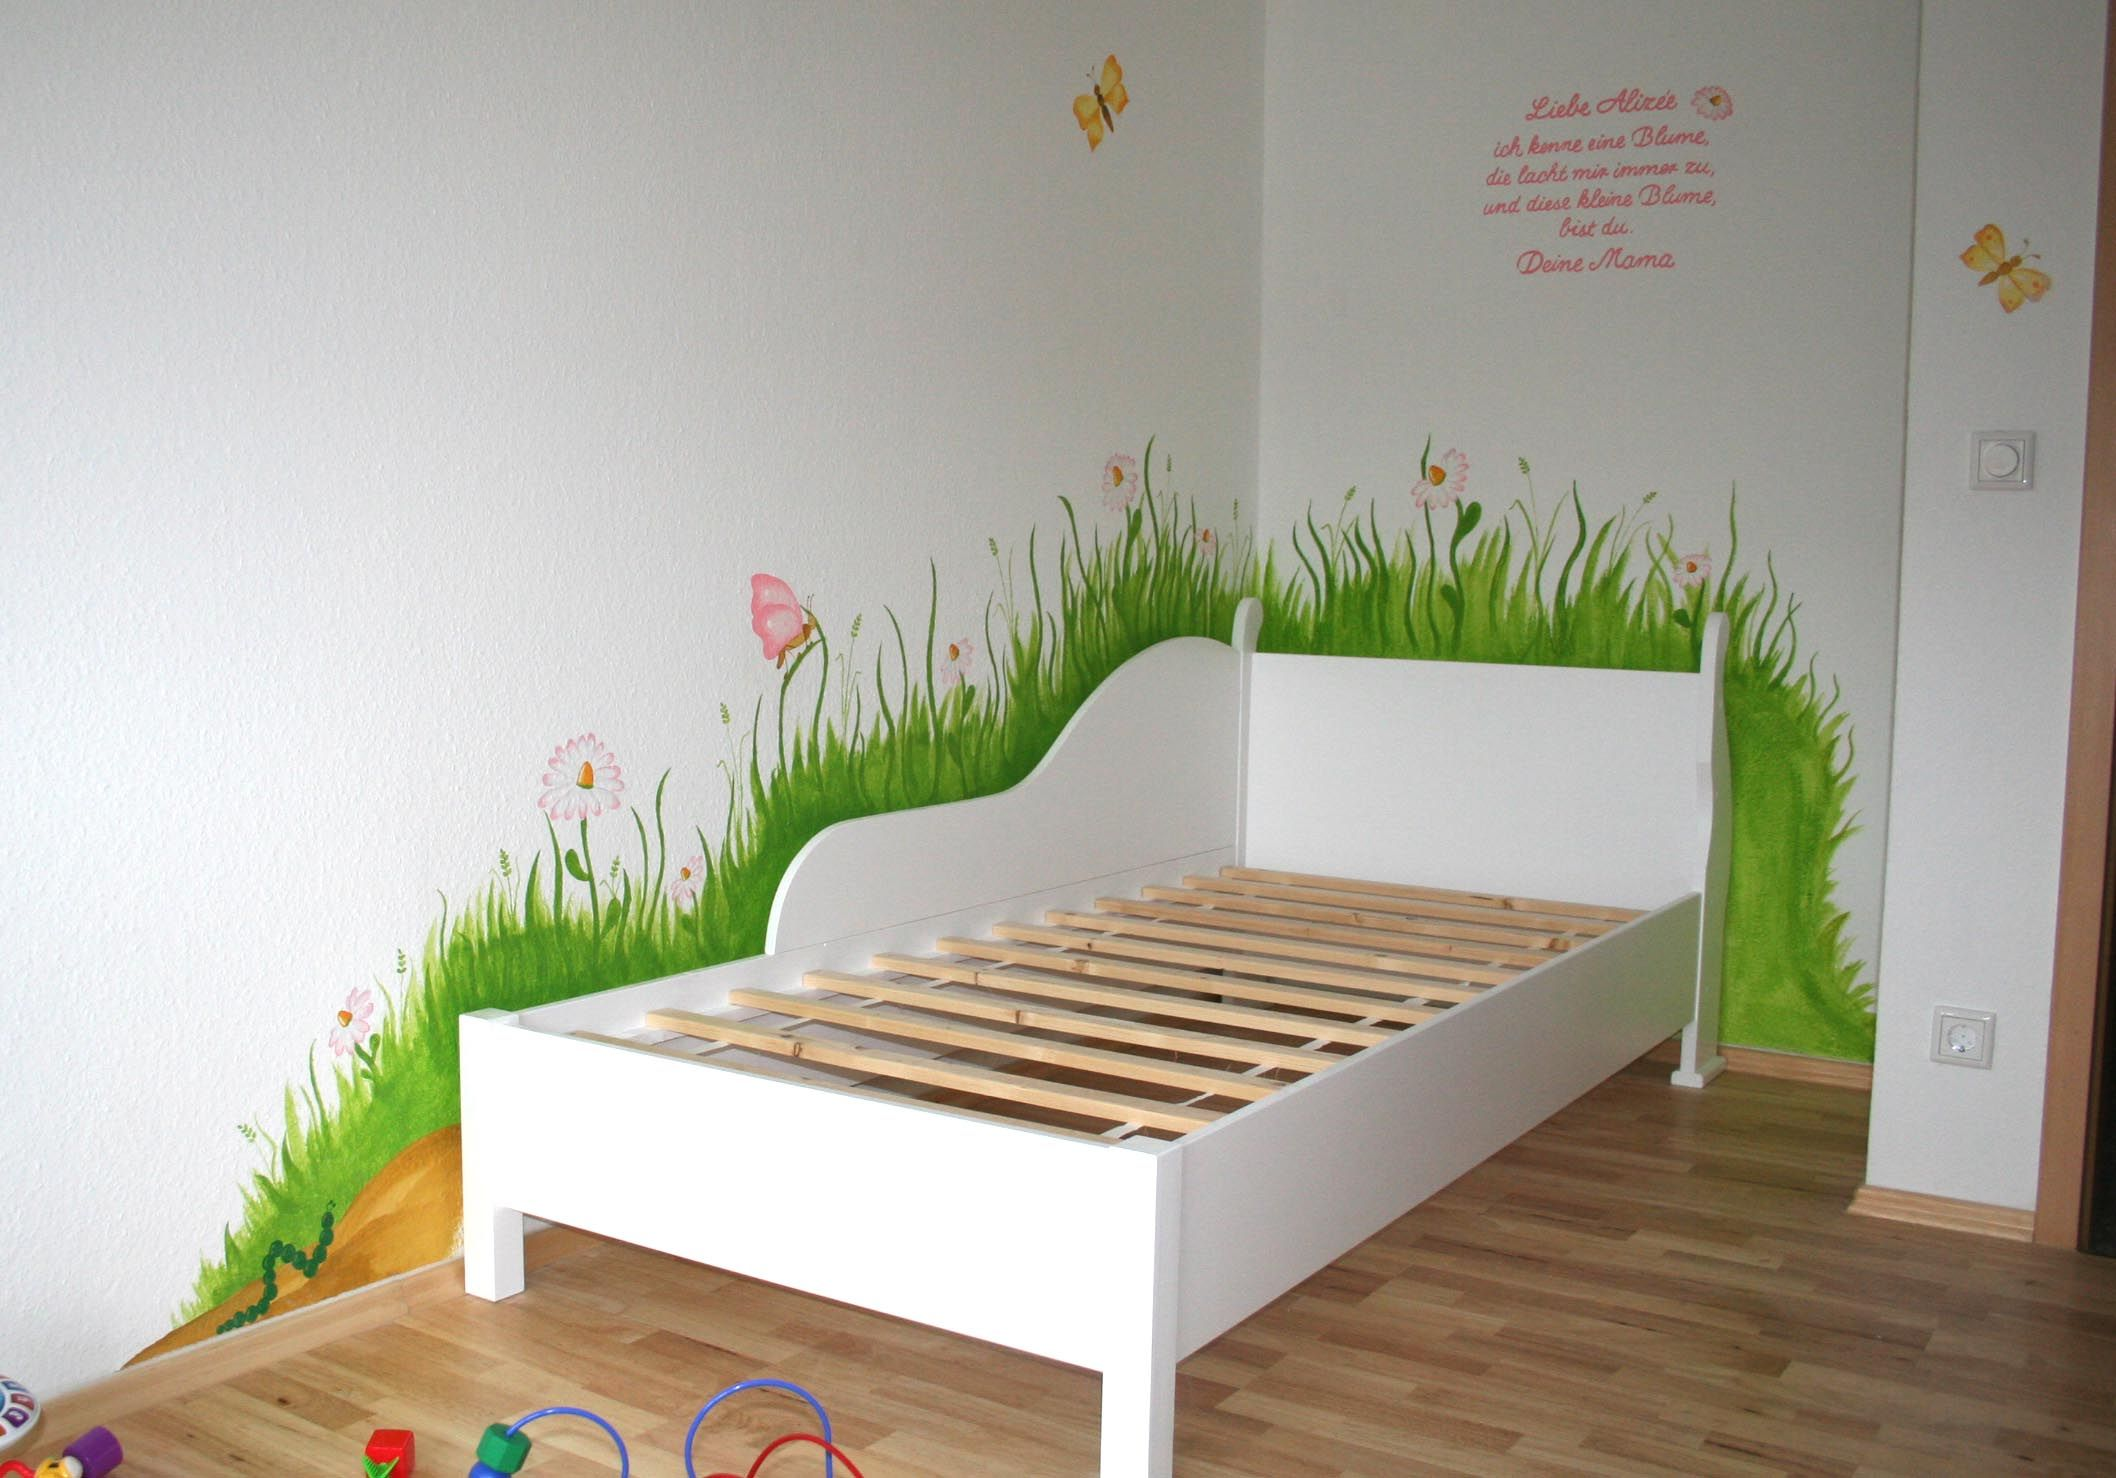 zwergraum blog blog archive wandmalerei f r das kinderzimmer b rn pinterest. Black Bedroom Furniture Sets. Home Design Ideas